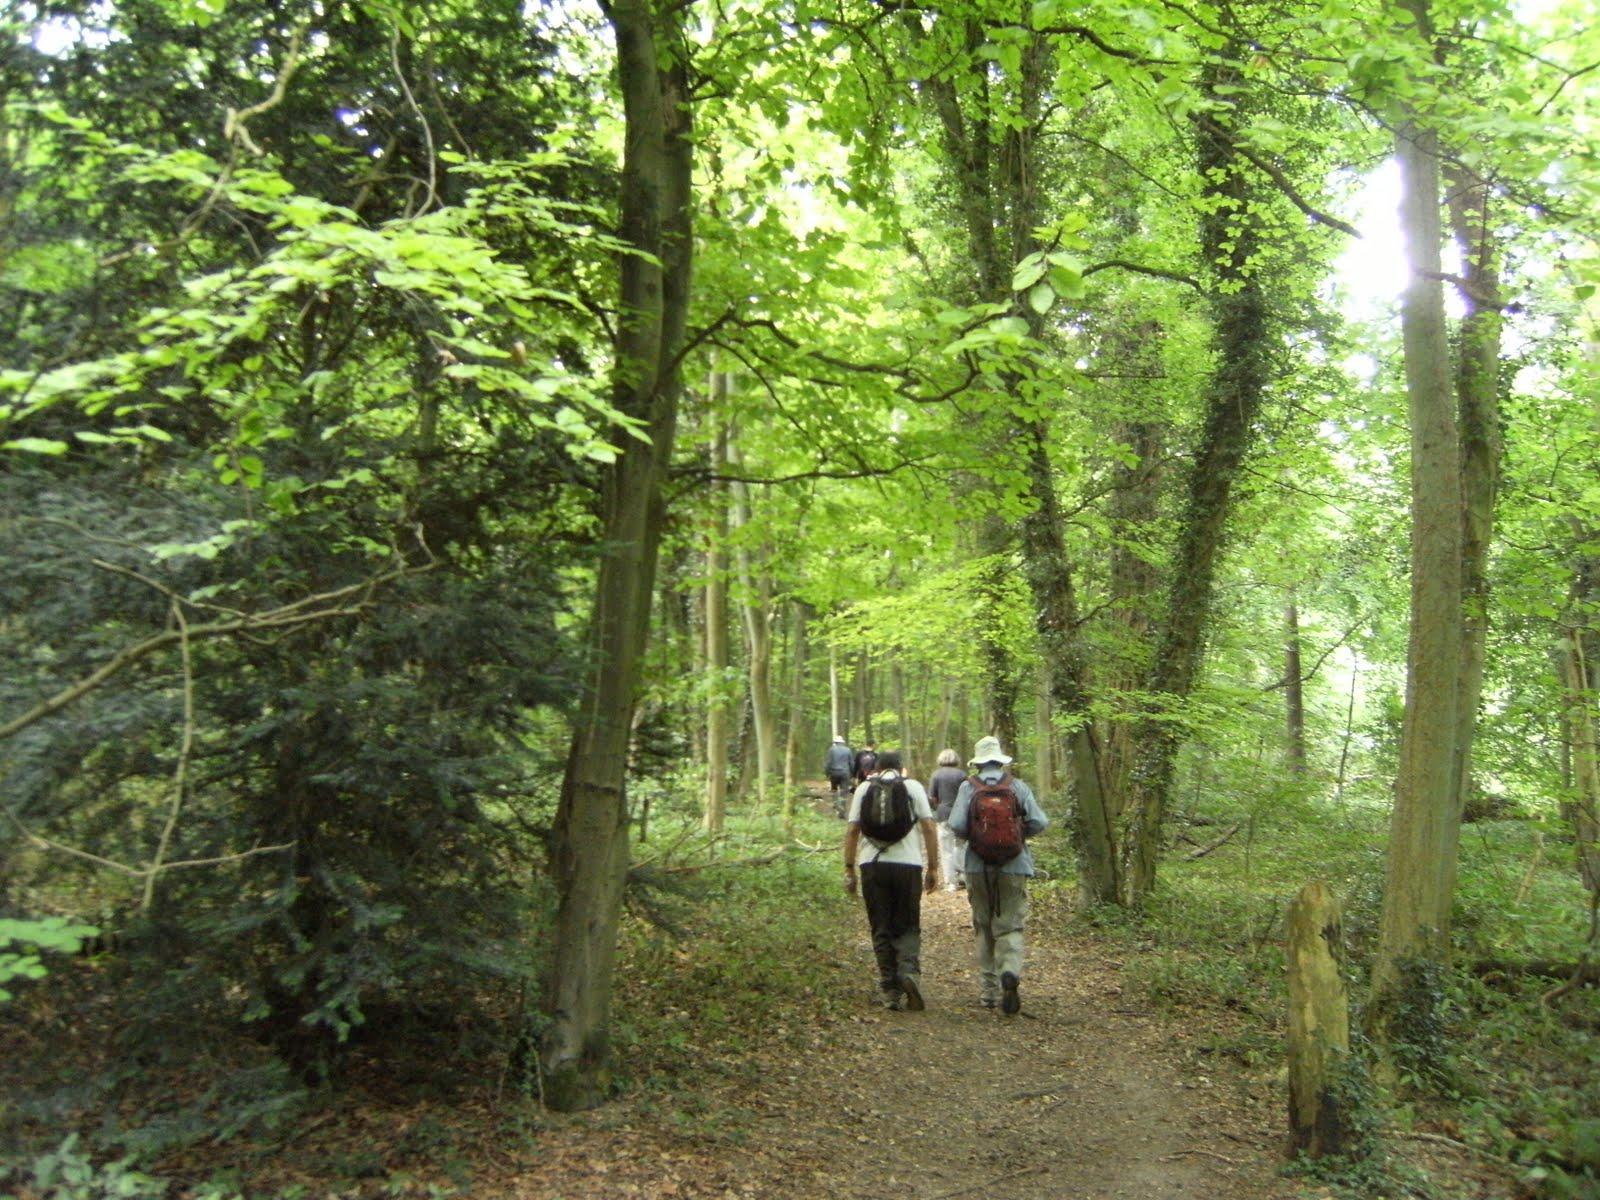 DSCF9328 Through Great Wood